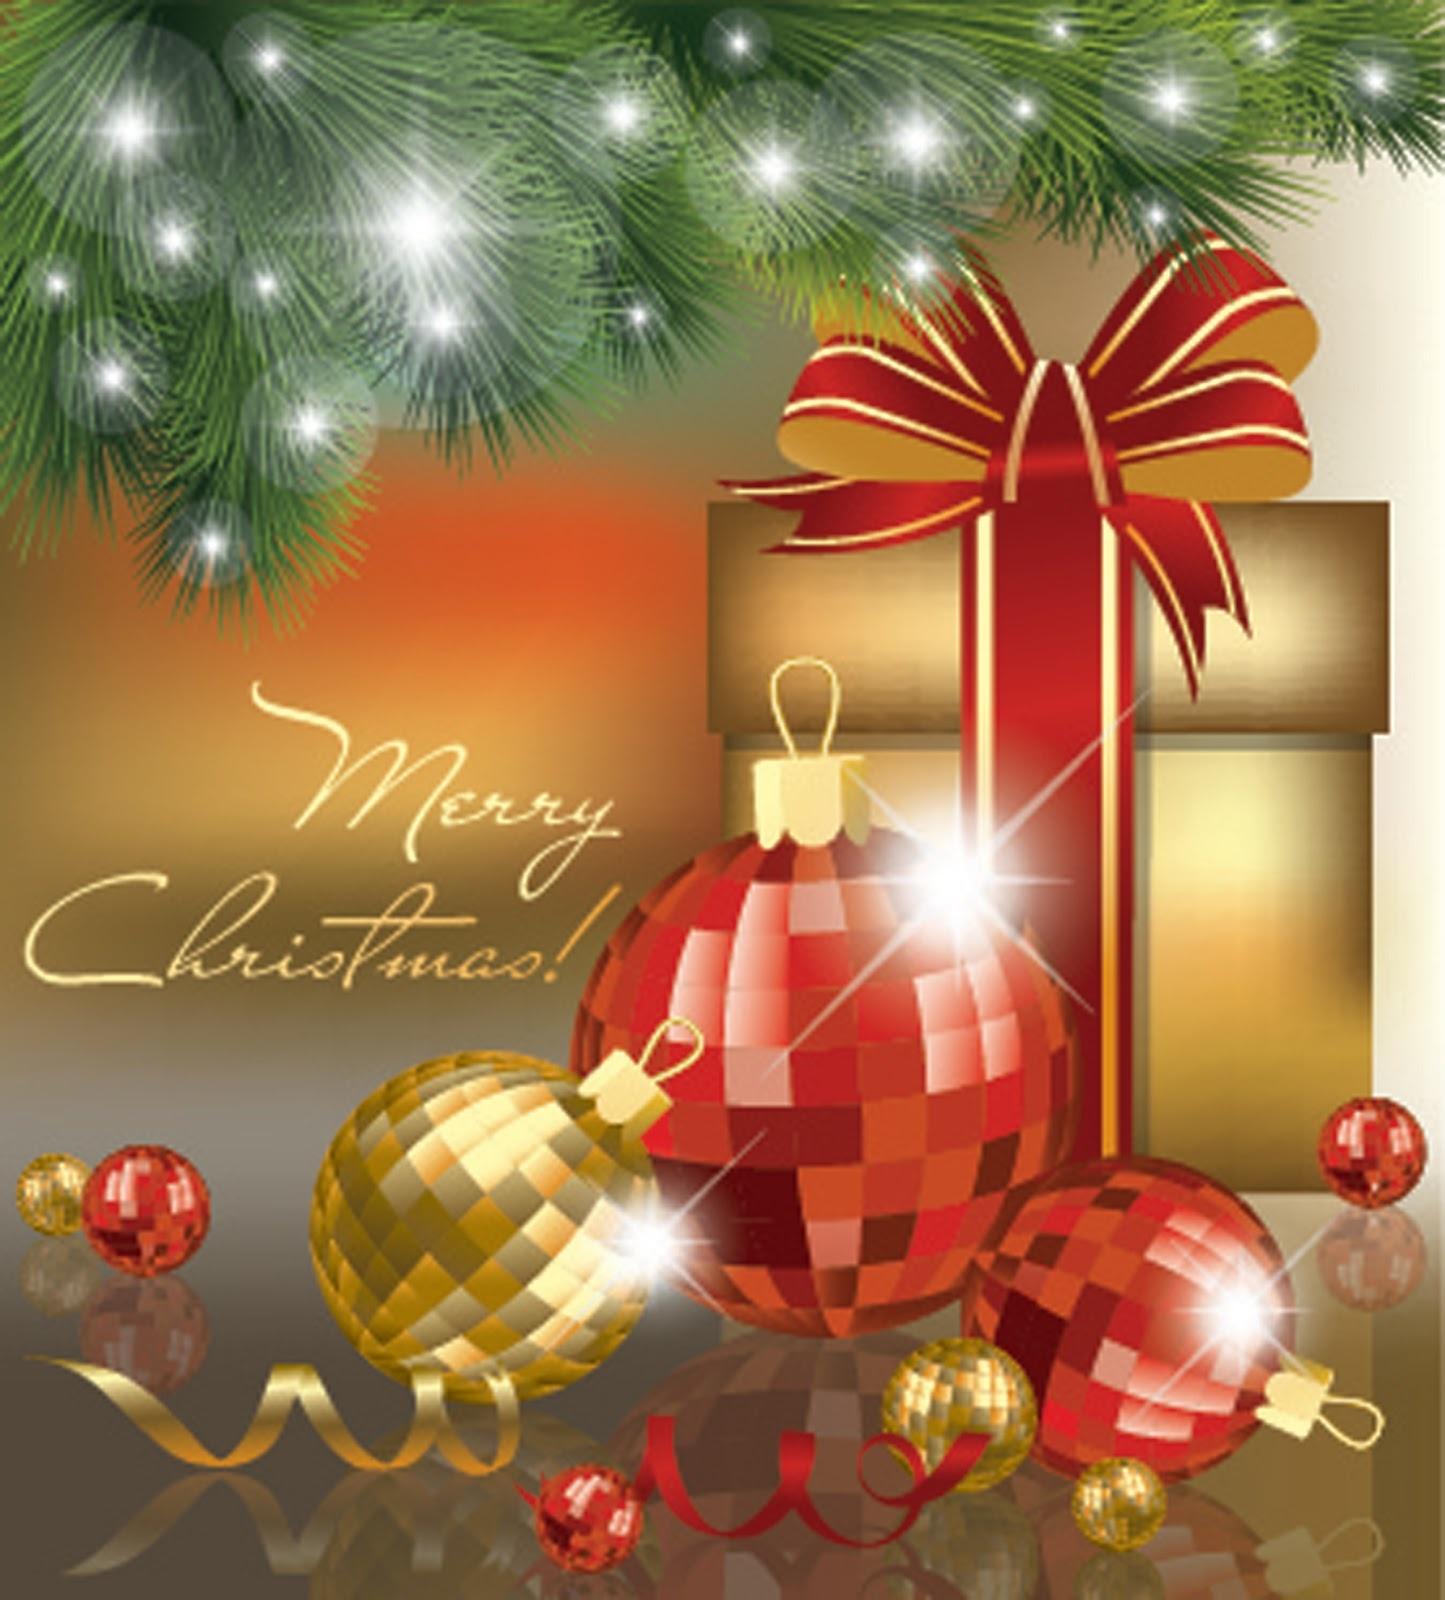 Free Christmas Card Templates Photos In Hd | Free Hd Widescreen - Free Online Christmas Photo Card Maker Printable